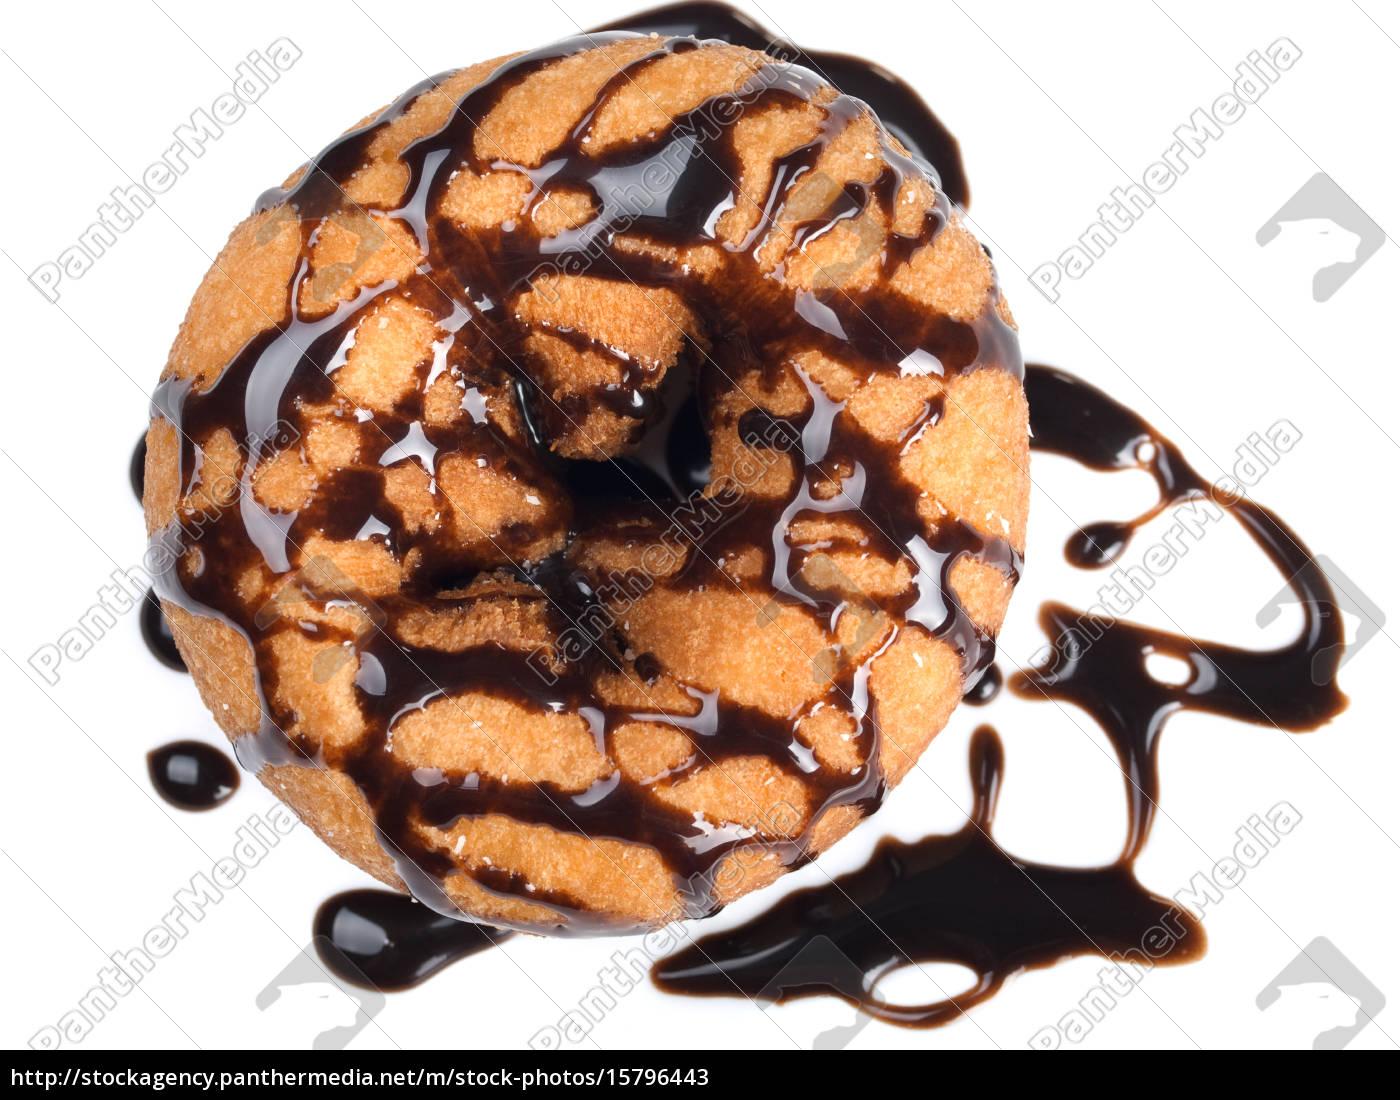 chocolate, donut, chocolate, donut, chocolate, donut, chocolate, donut, chocolate, donut, chocolate - 15796443